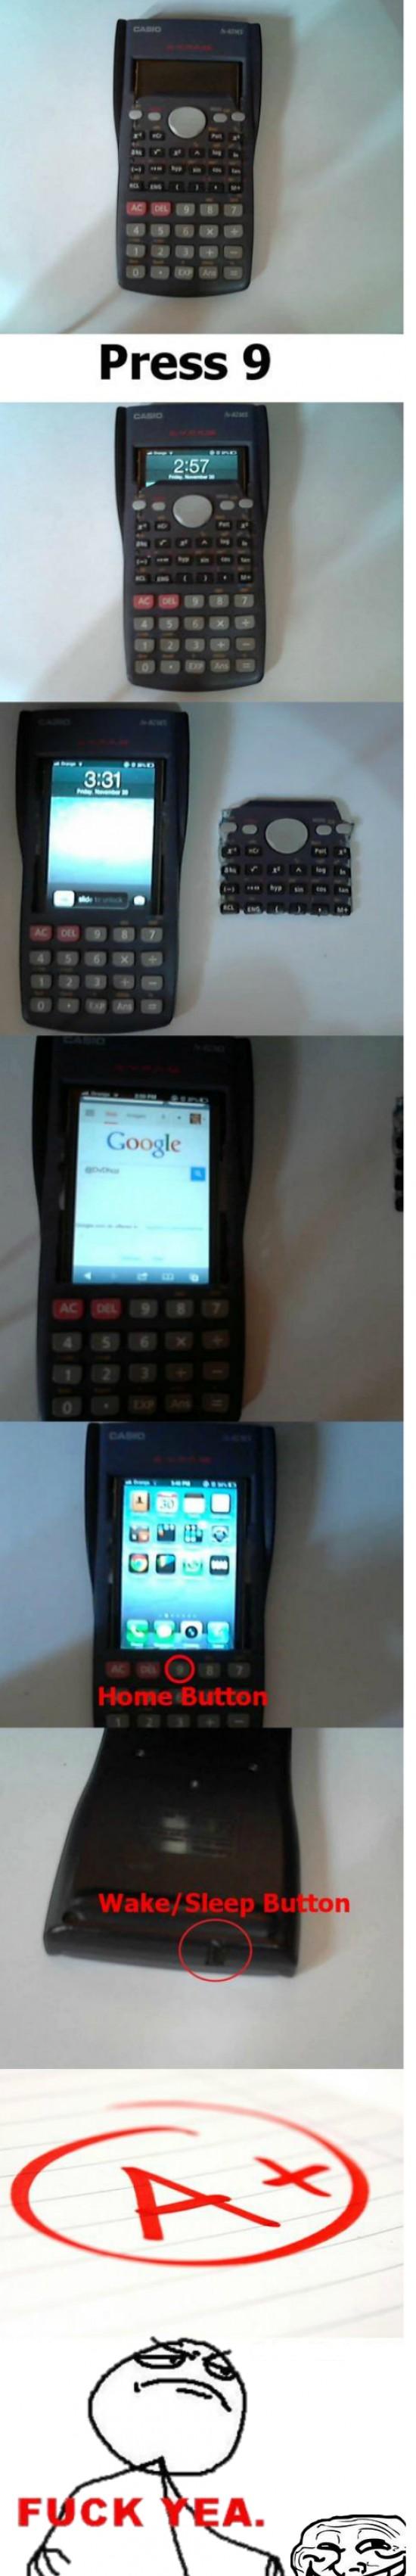 calculadora,escondido,fuckyea,iphone,movil,ninja,smartphone,troll